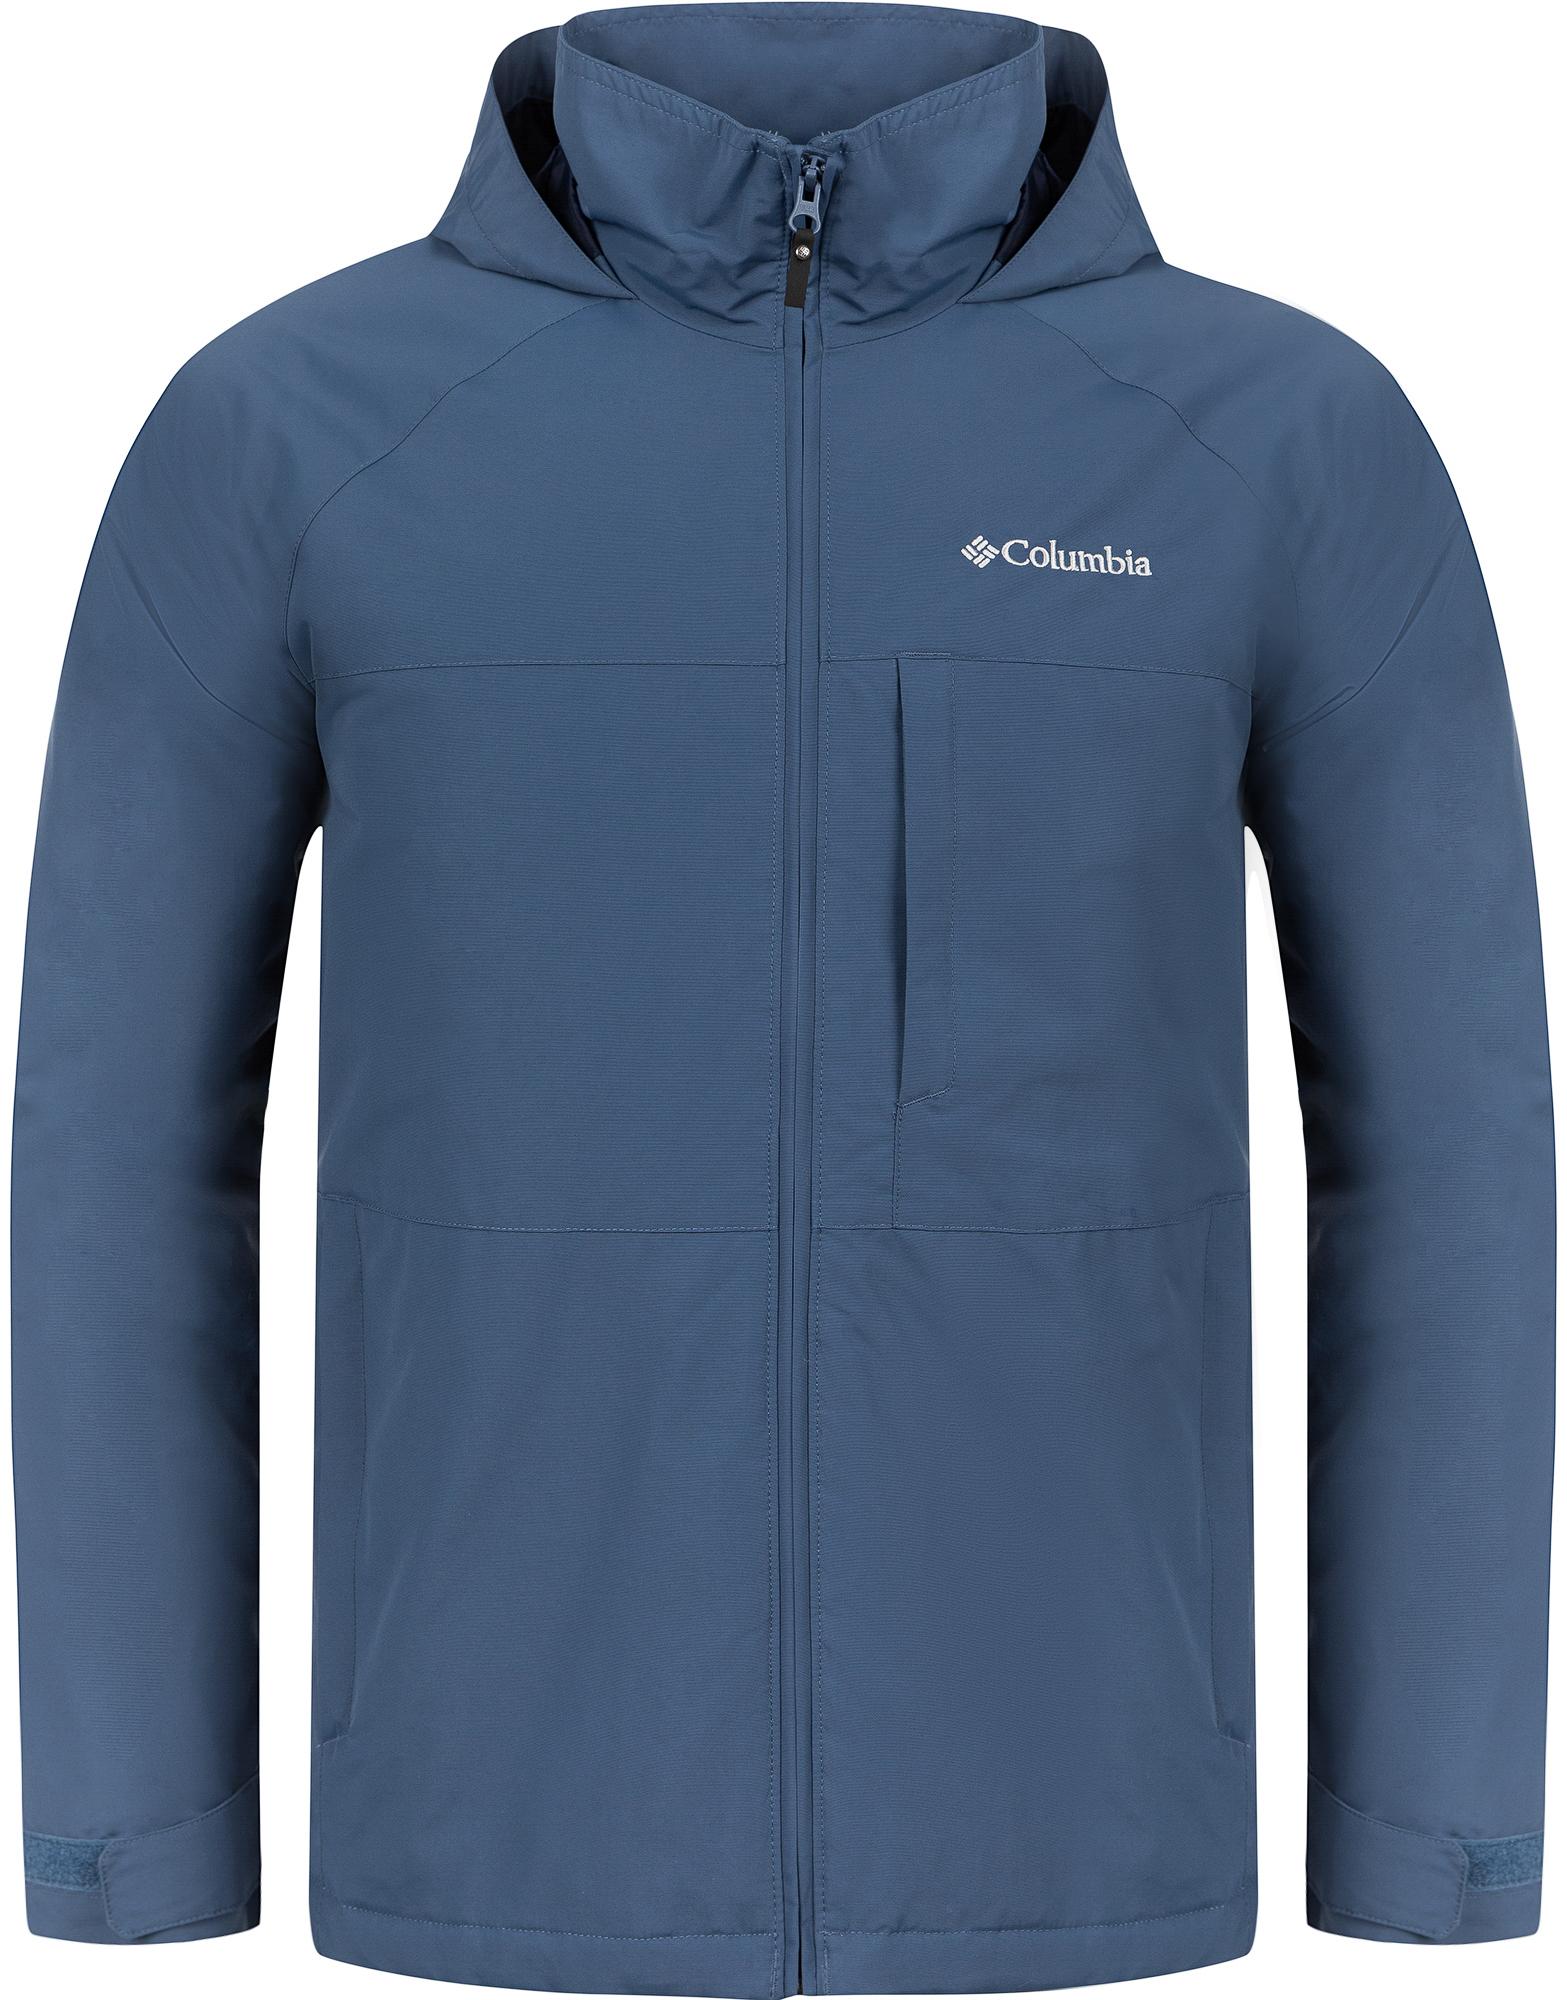 Columbia Куртка утепленная мужская Columbia Emerald Creek, размер 54